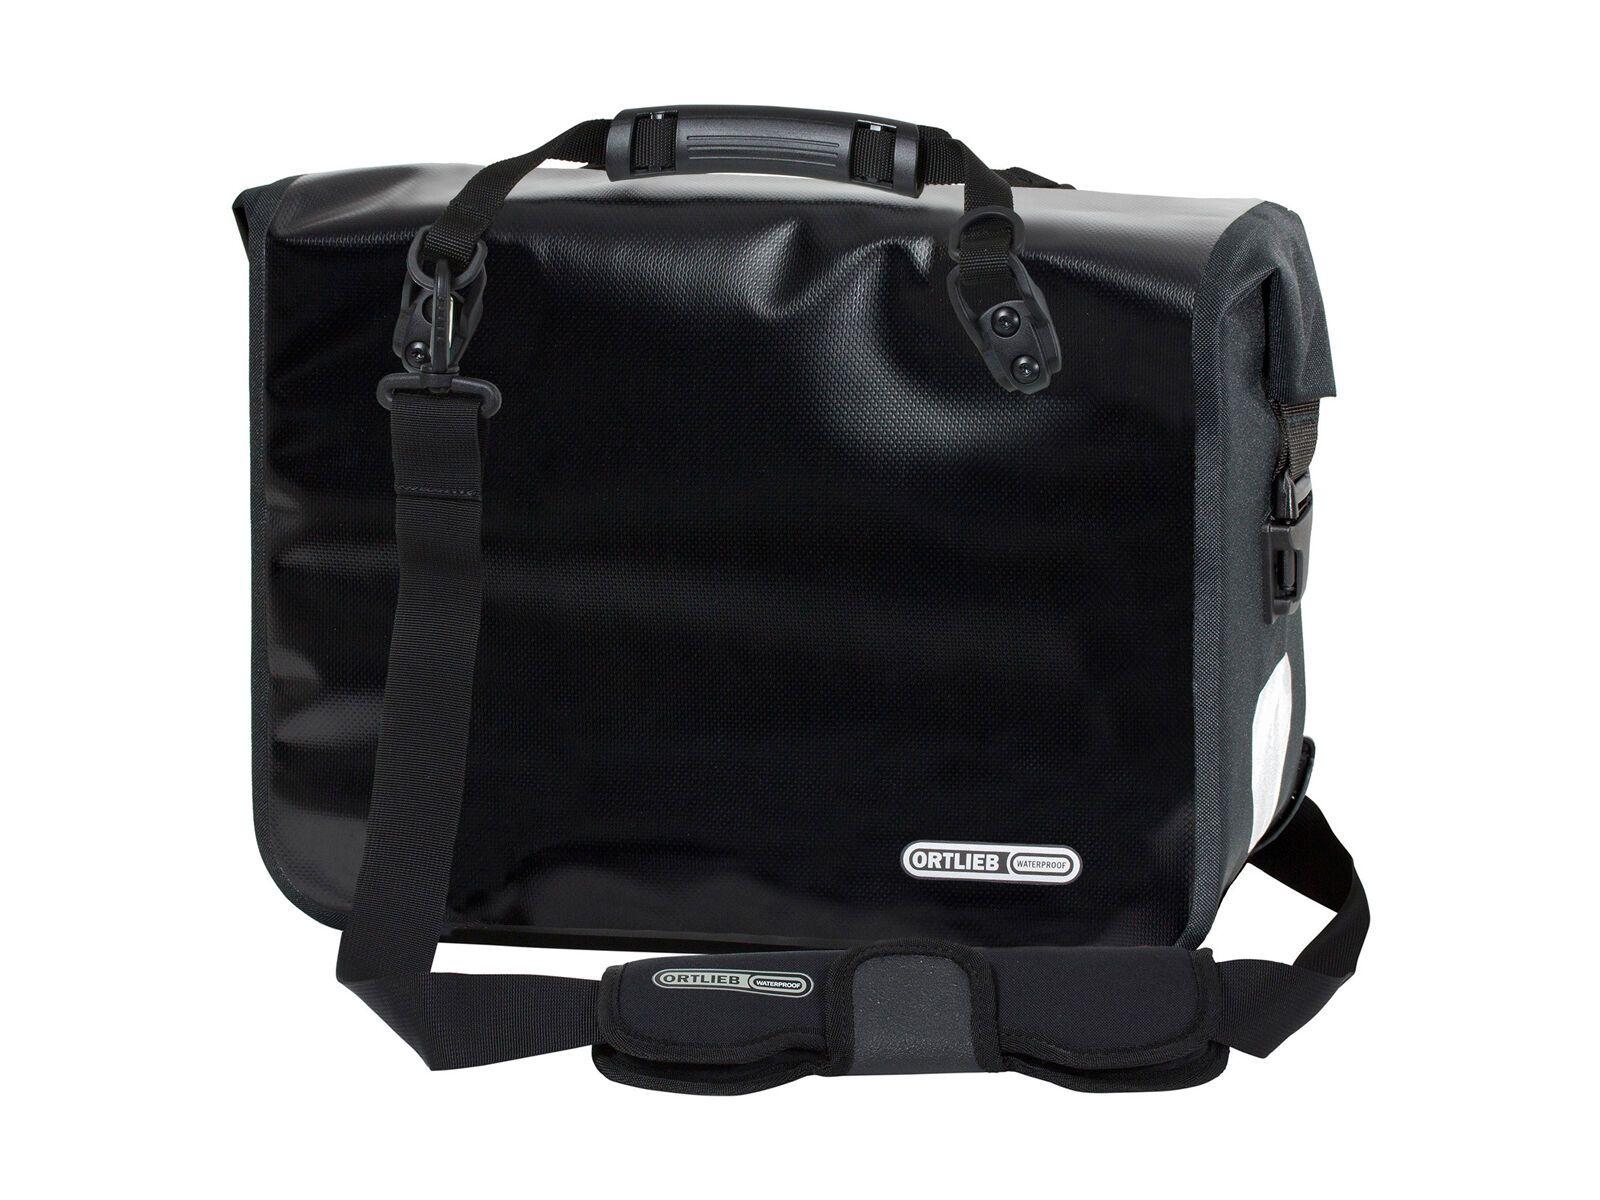 Ortlieb Office-Bag QL2.1, black - Fahrradtasche F70709